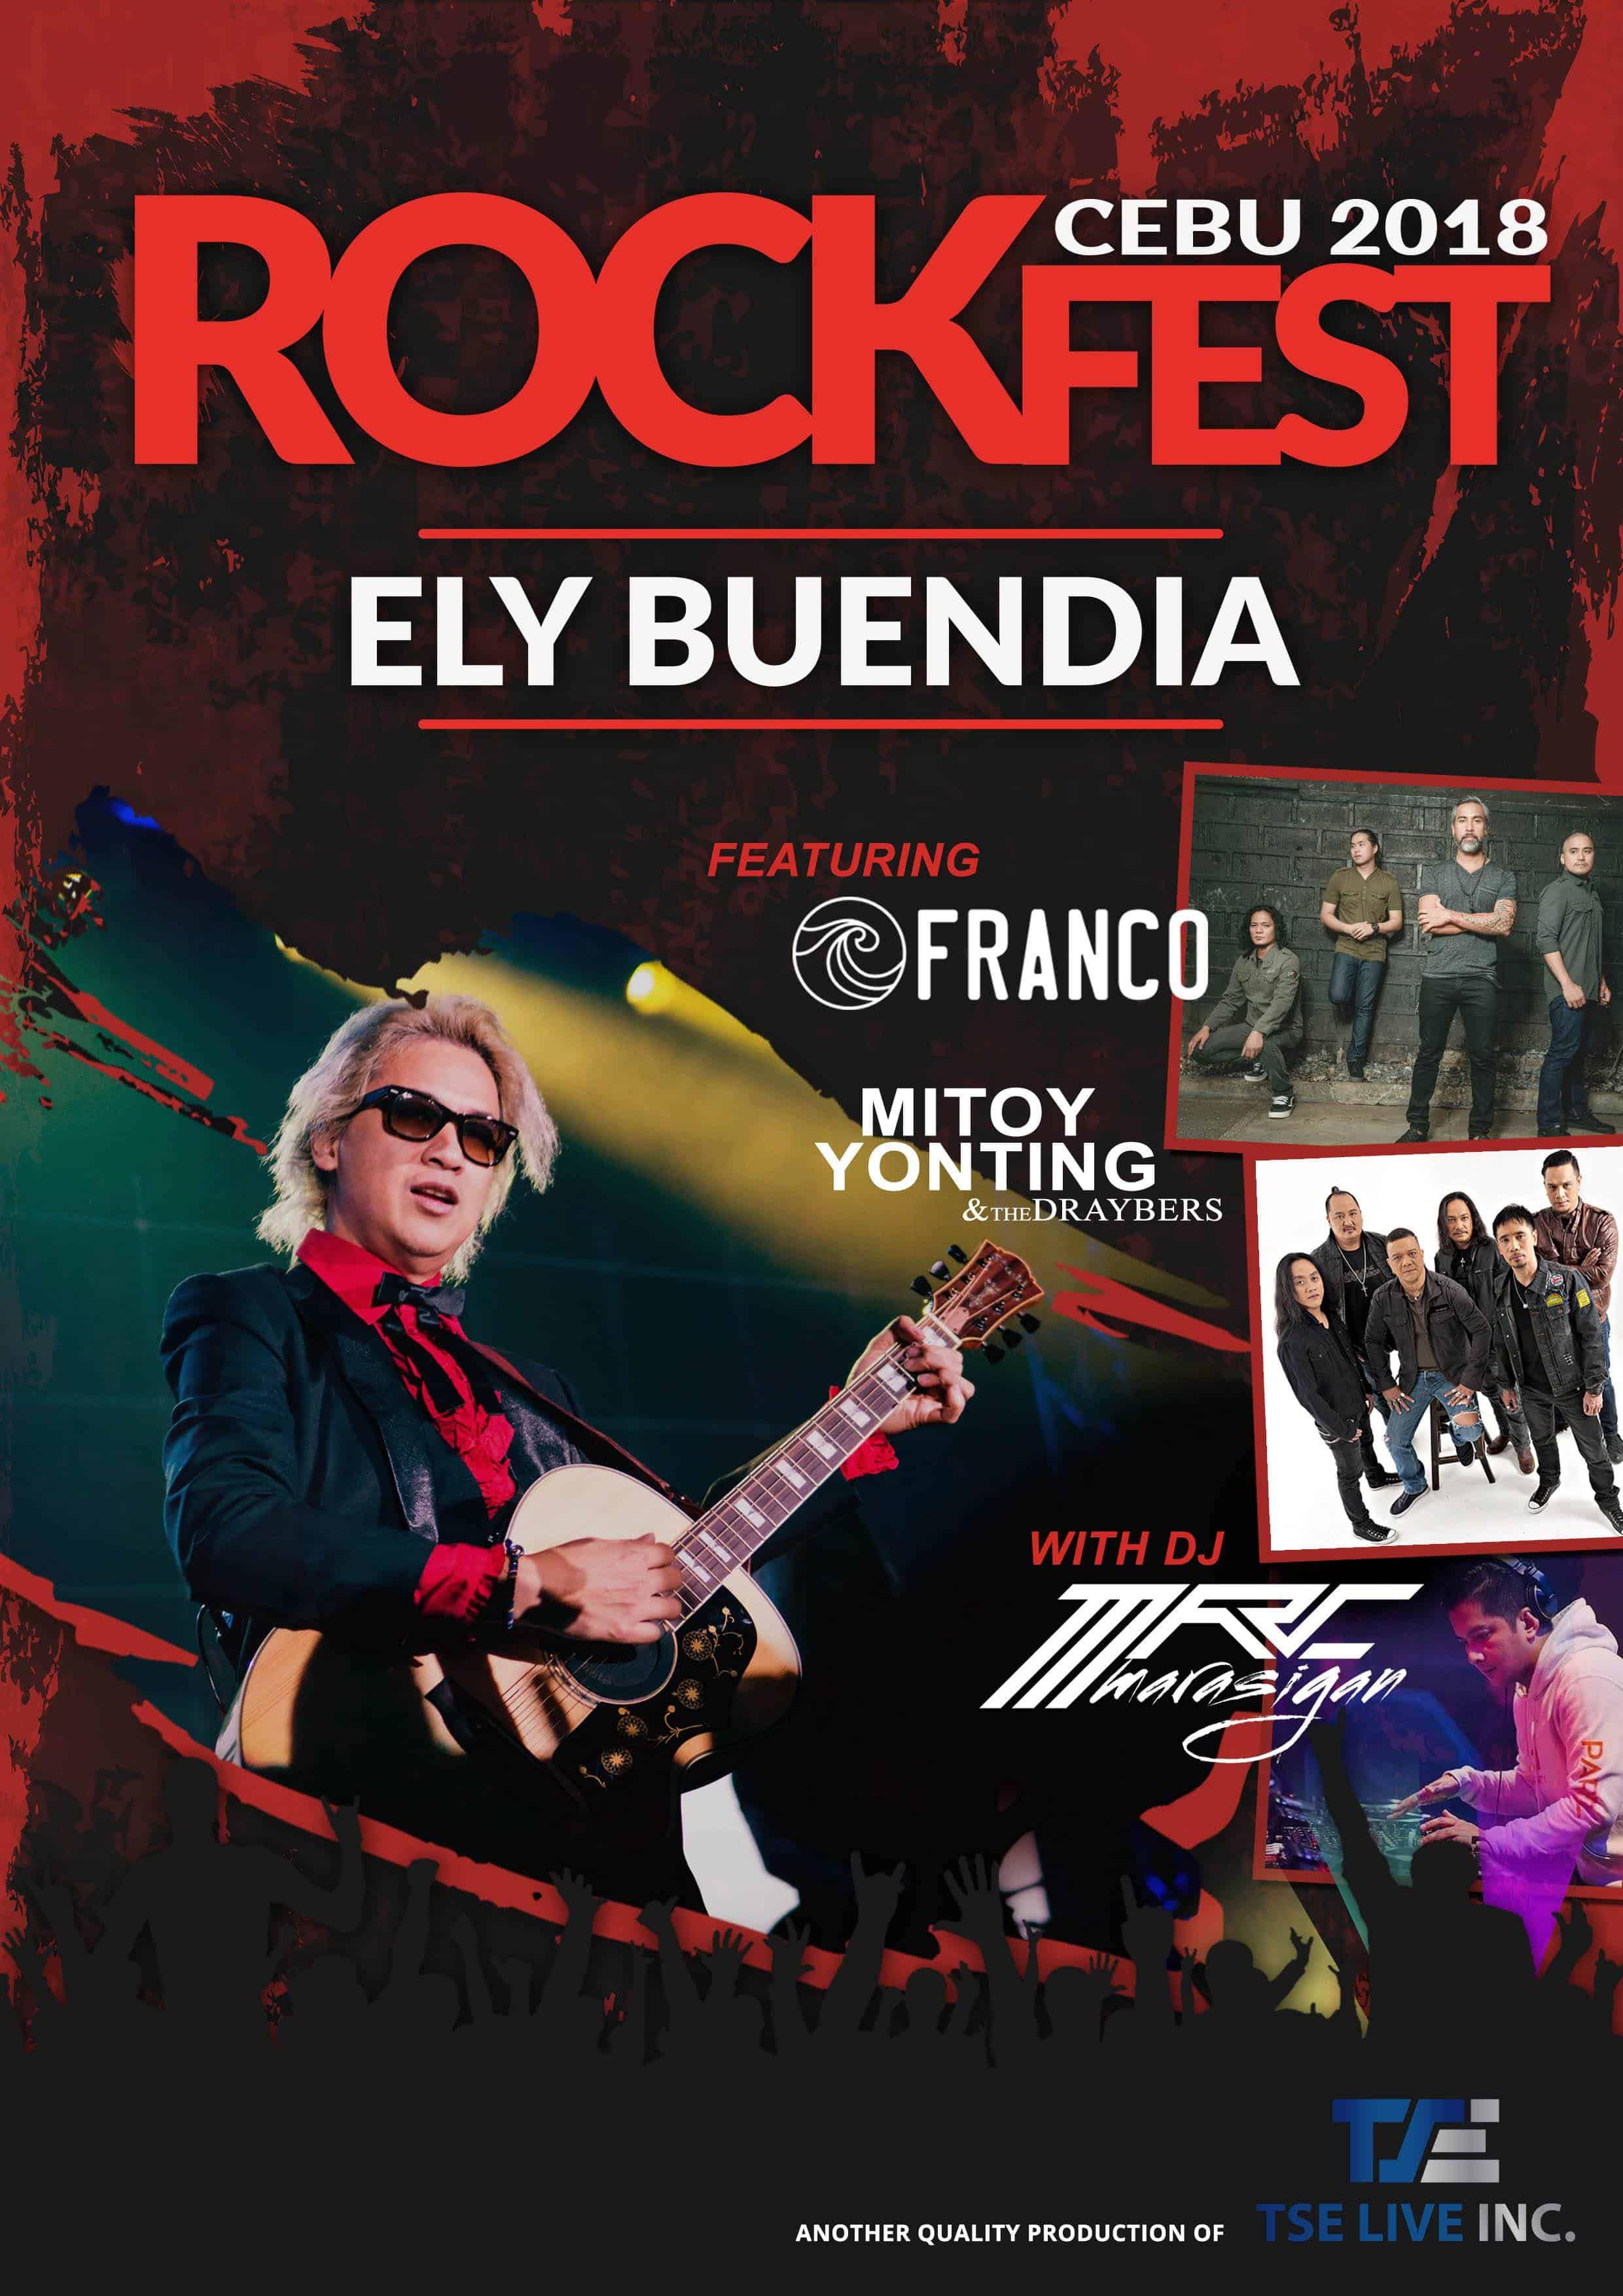 Rockfest 2018 Cebu Ely Buendia